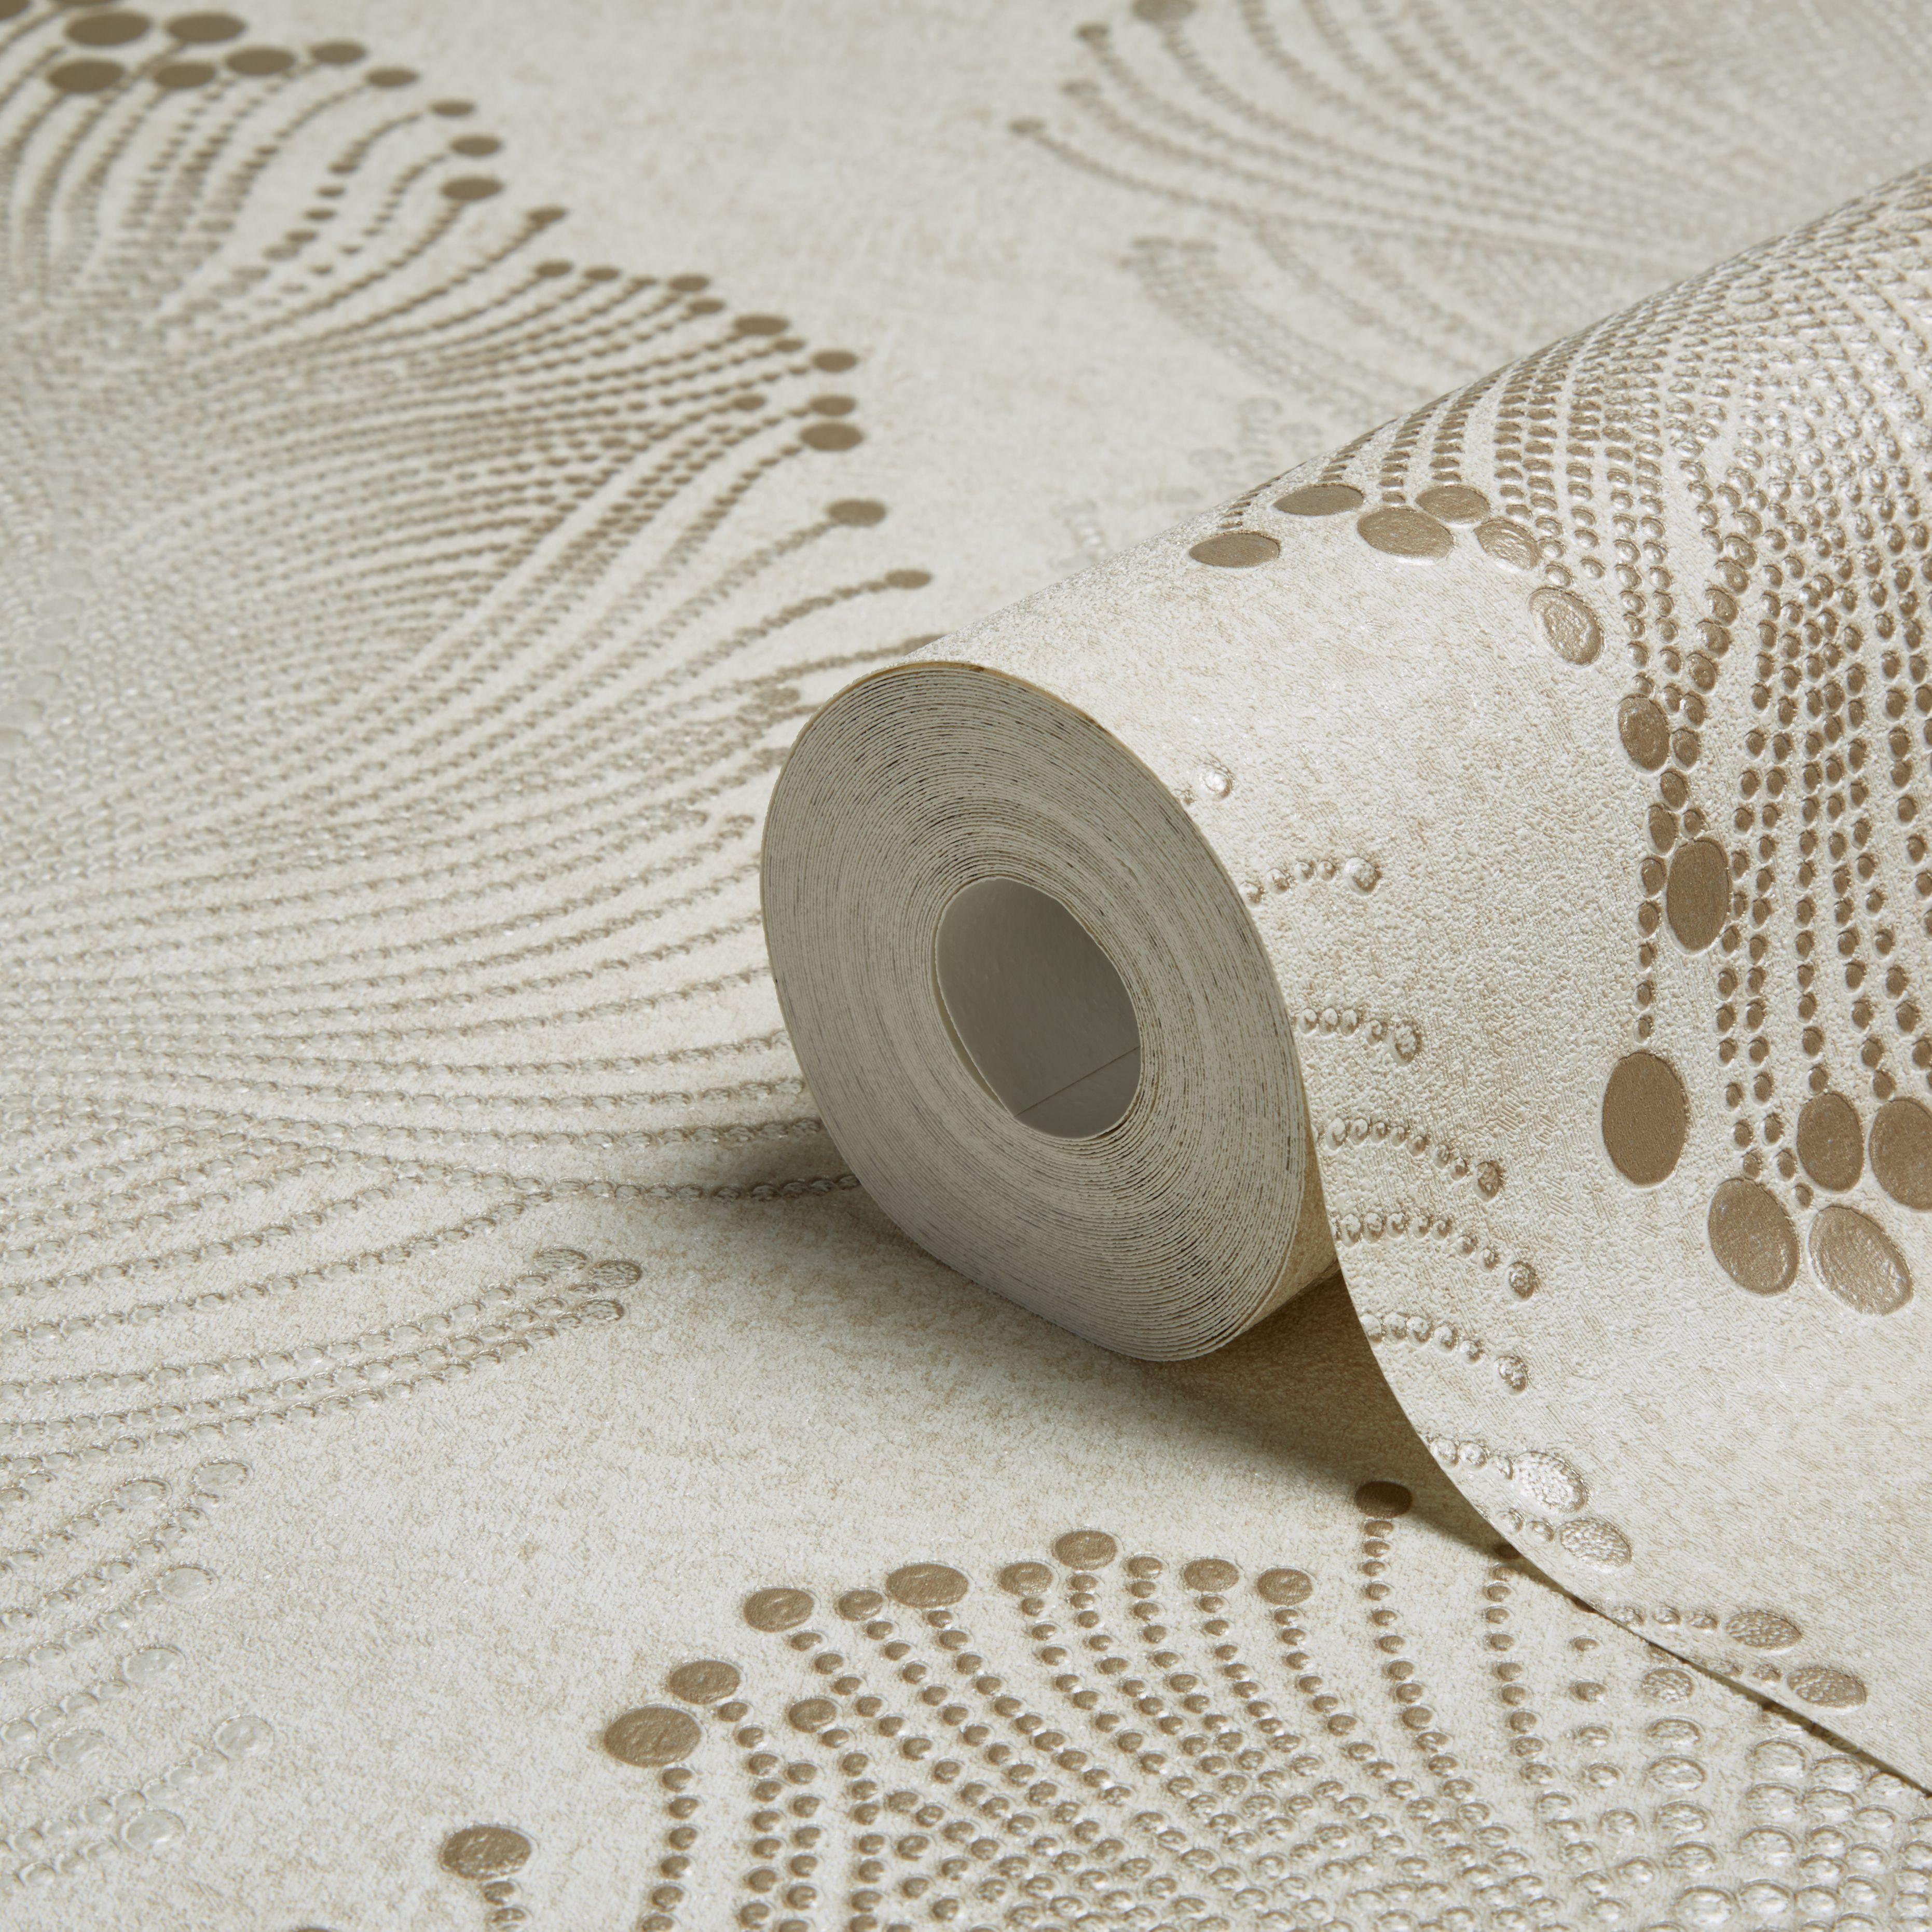 A.S. Creation Bohemian Burlesque Gold & Beige Feather Print Metallic ...